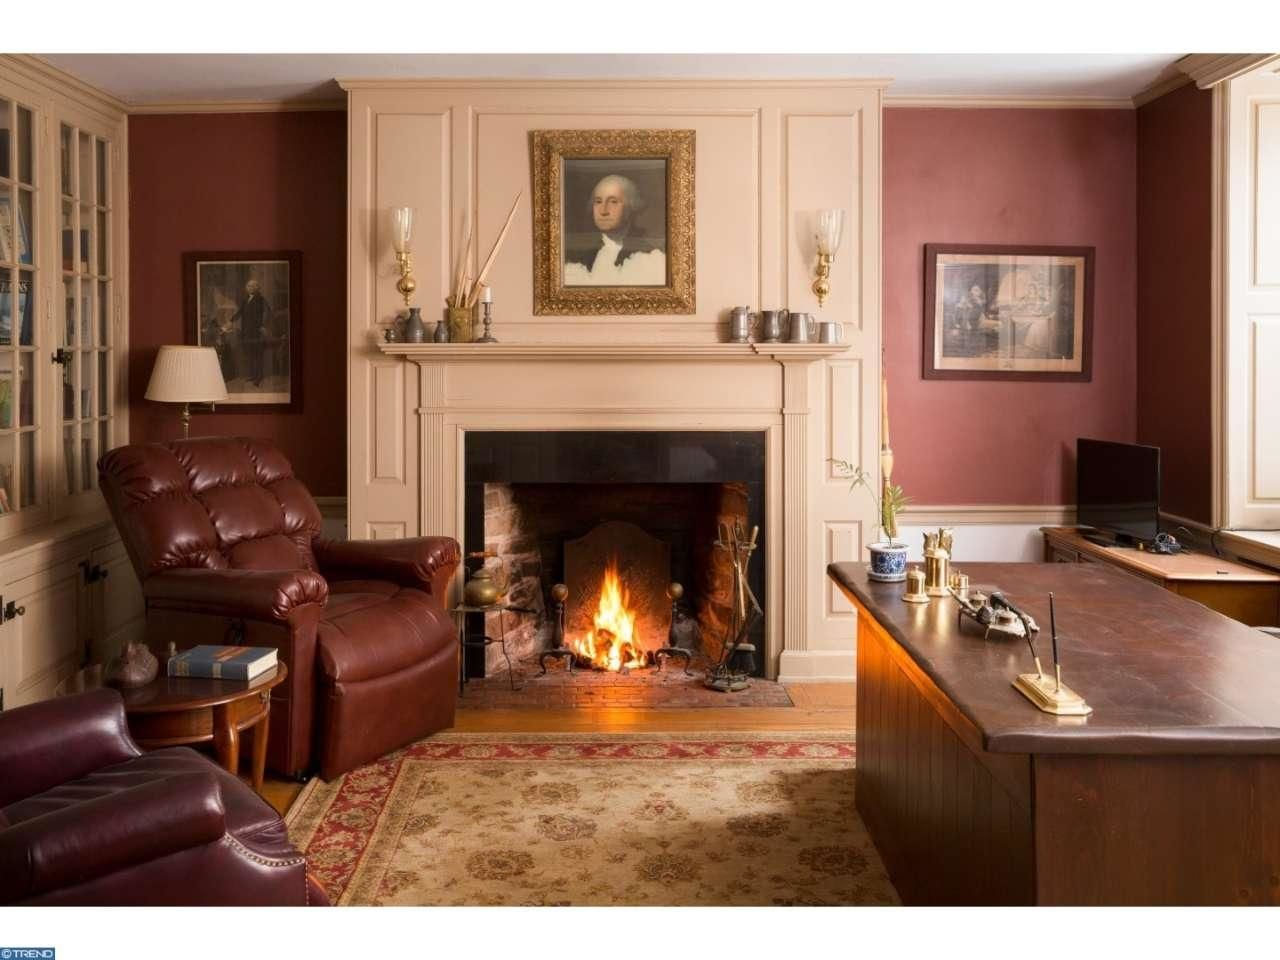 2377 Quarry Road Buckingham, PA 18902 (1) Home, New